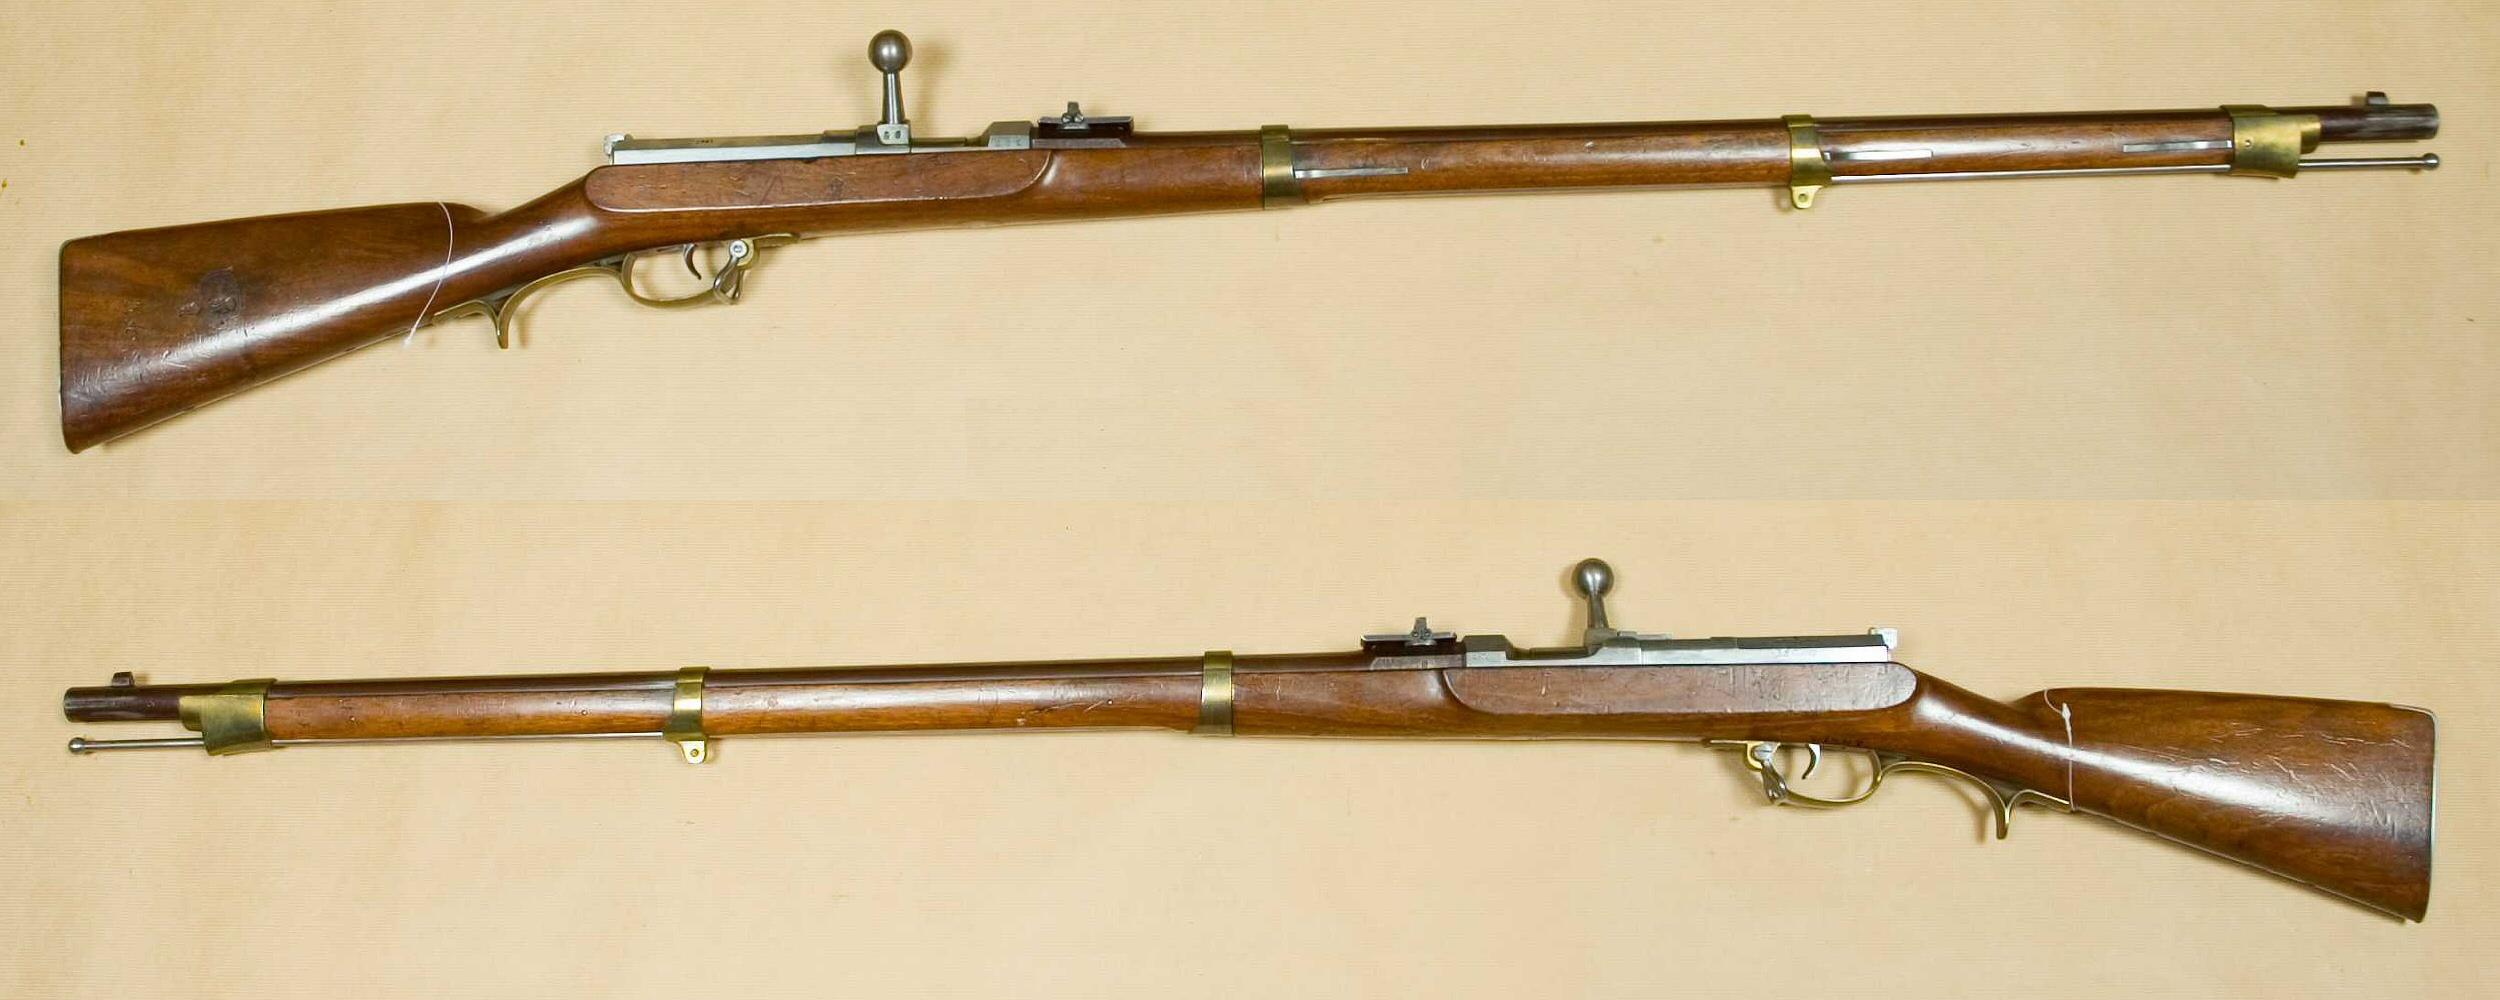 http://upload.wikimedia.org/wikipedia/commons/3/30/Z%C3%BCndnadelgewehr_m-1841_-_Preussen_-_Arm%C3%A9museum.jpg